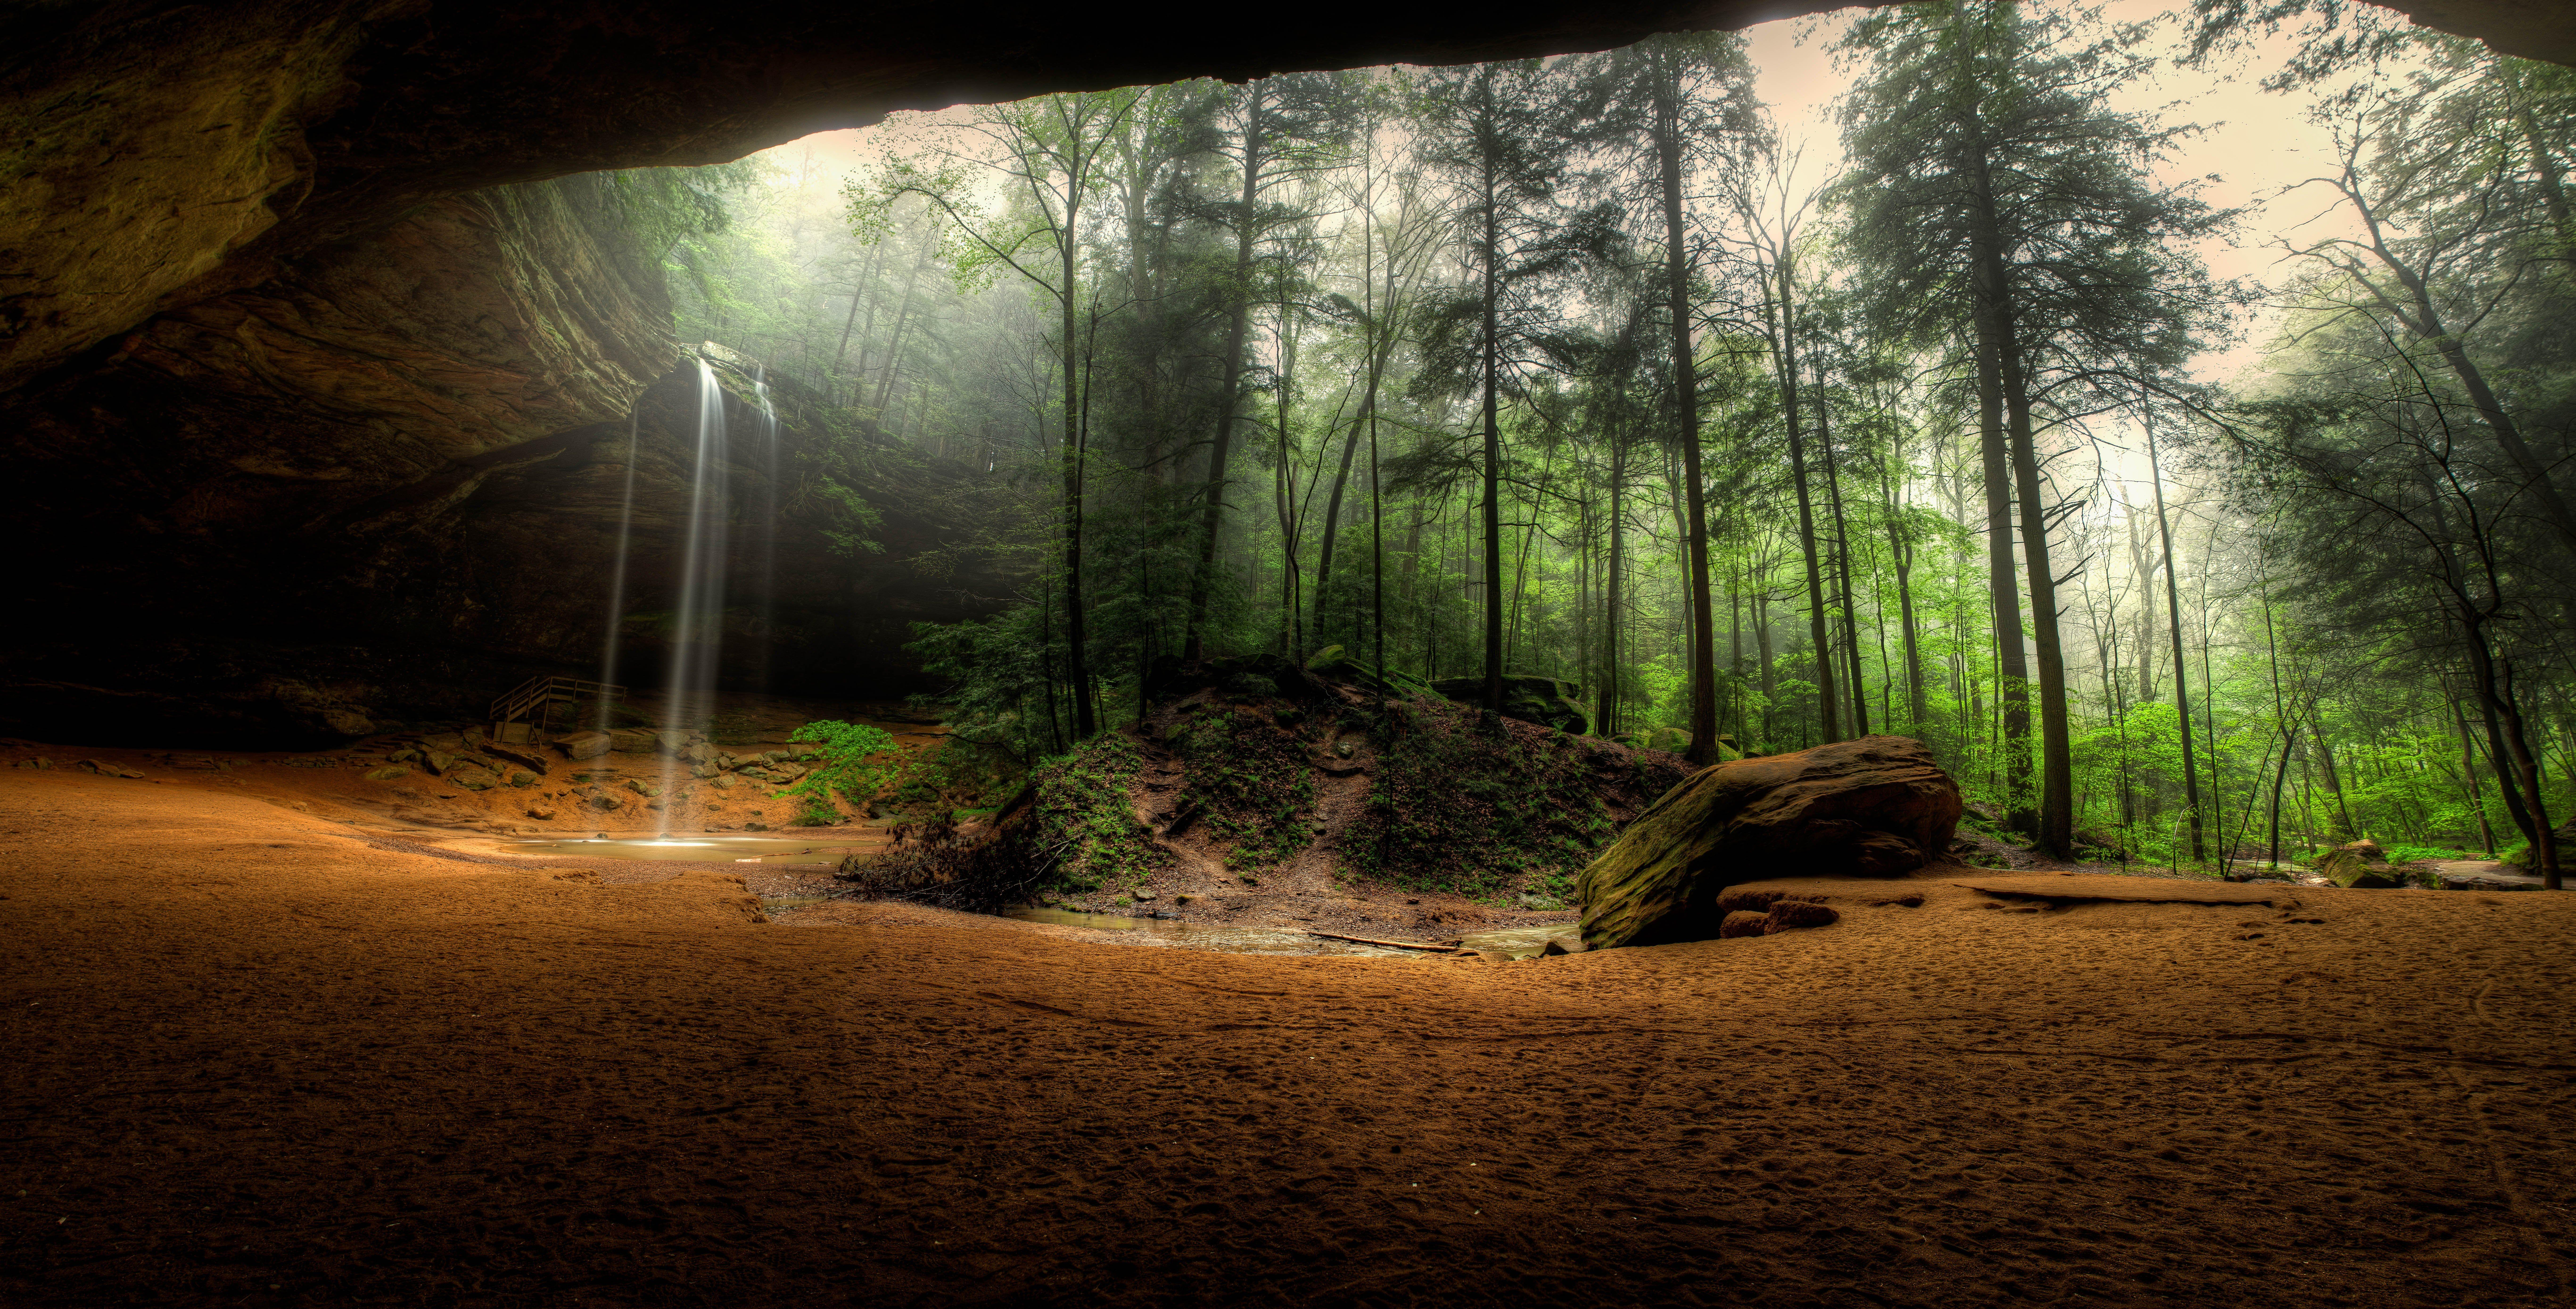 4K Nature HD Background Wallpaper Download - High Resolution